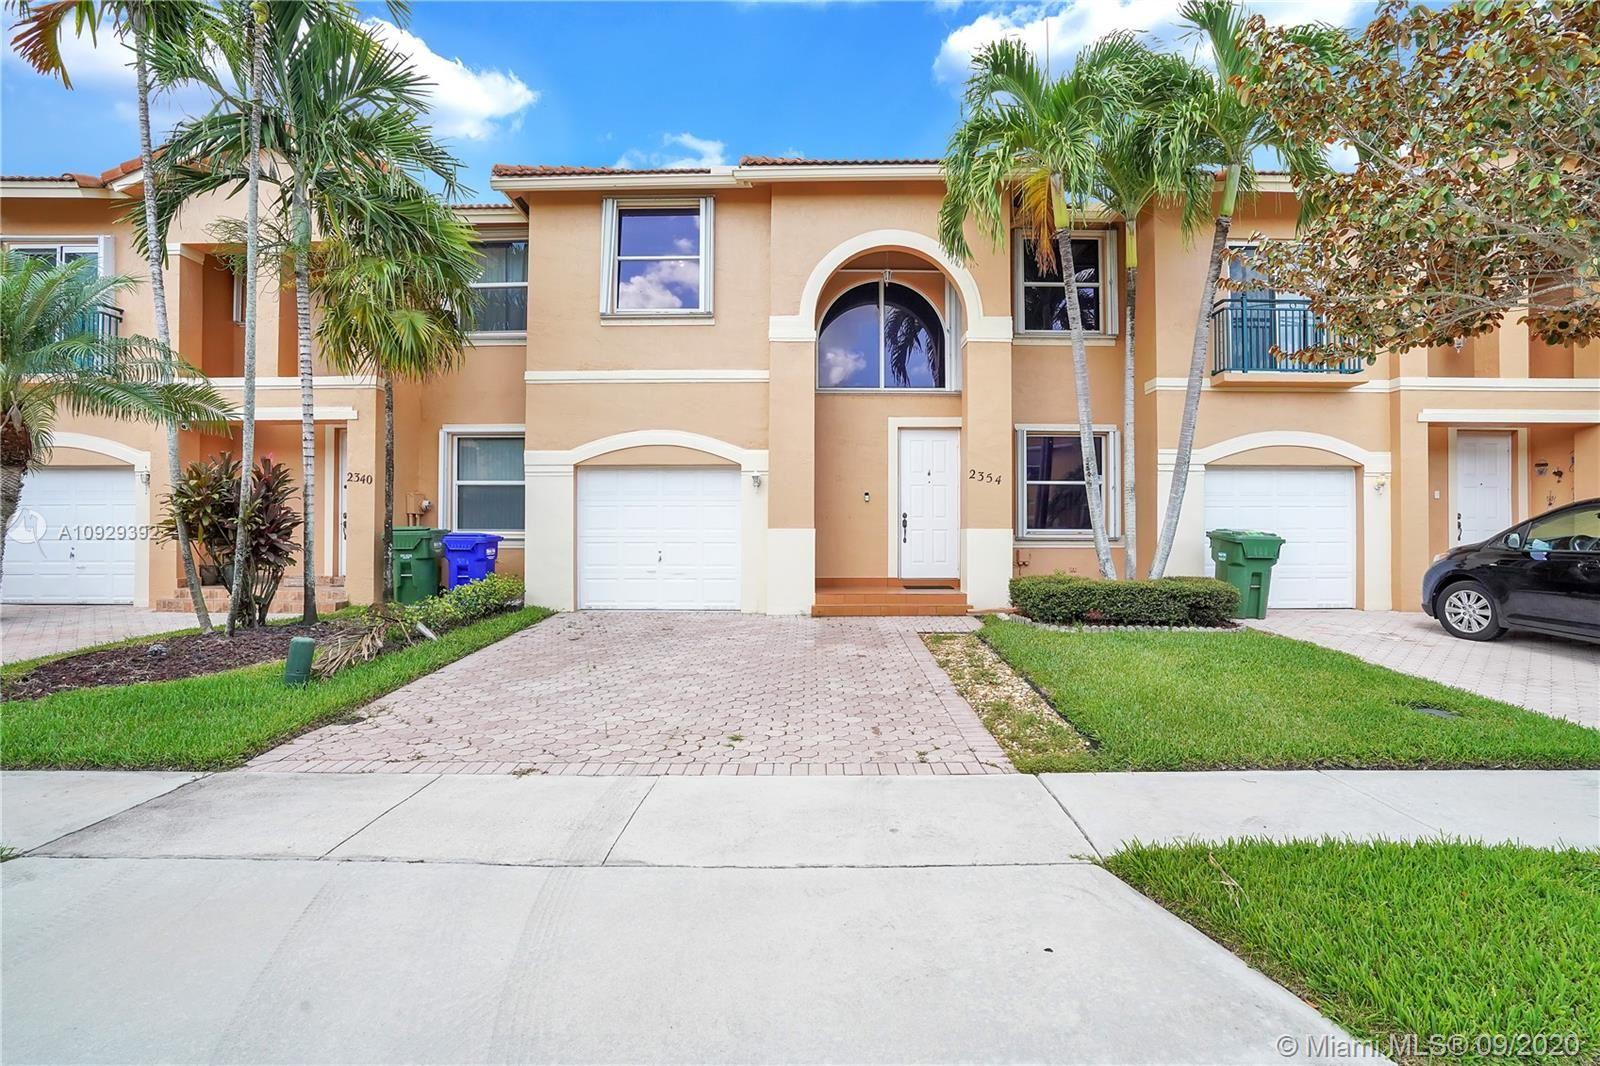 2354 NW 161st Ave #., Pembroke Pines, FL 33028 - #: A10929392